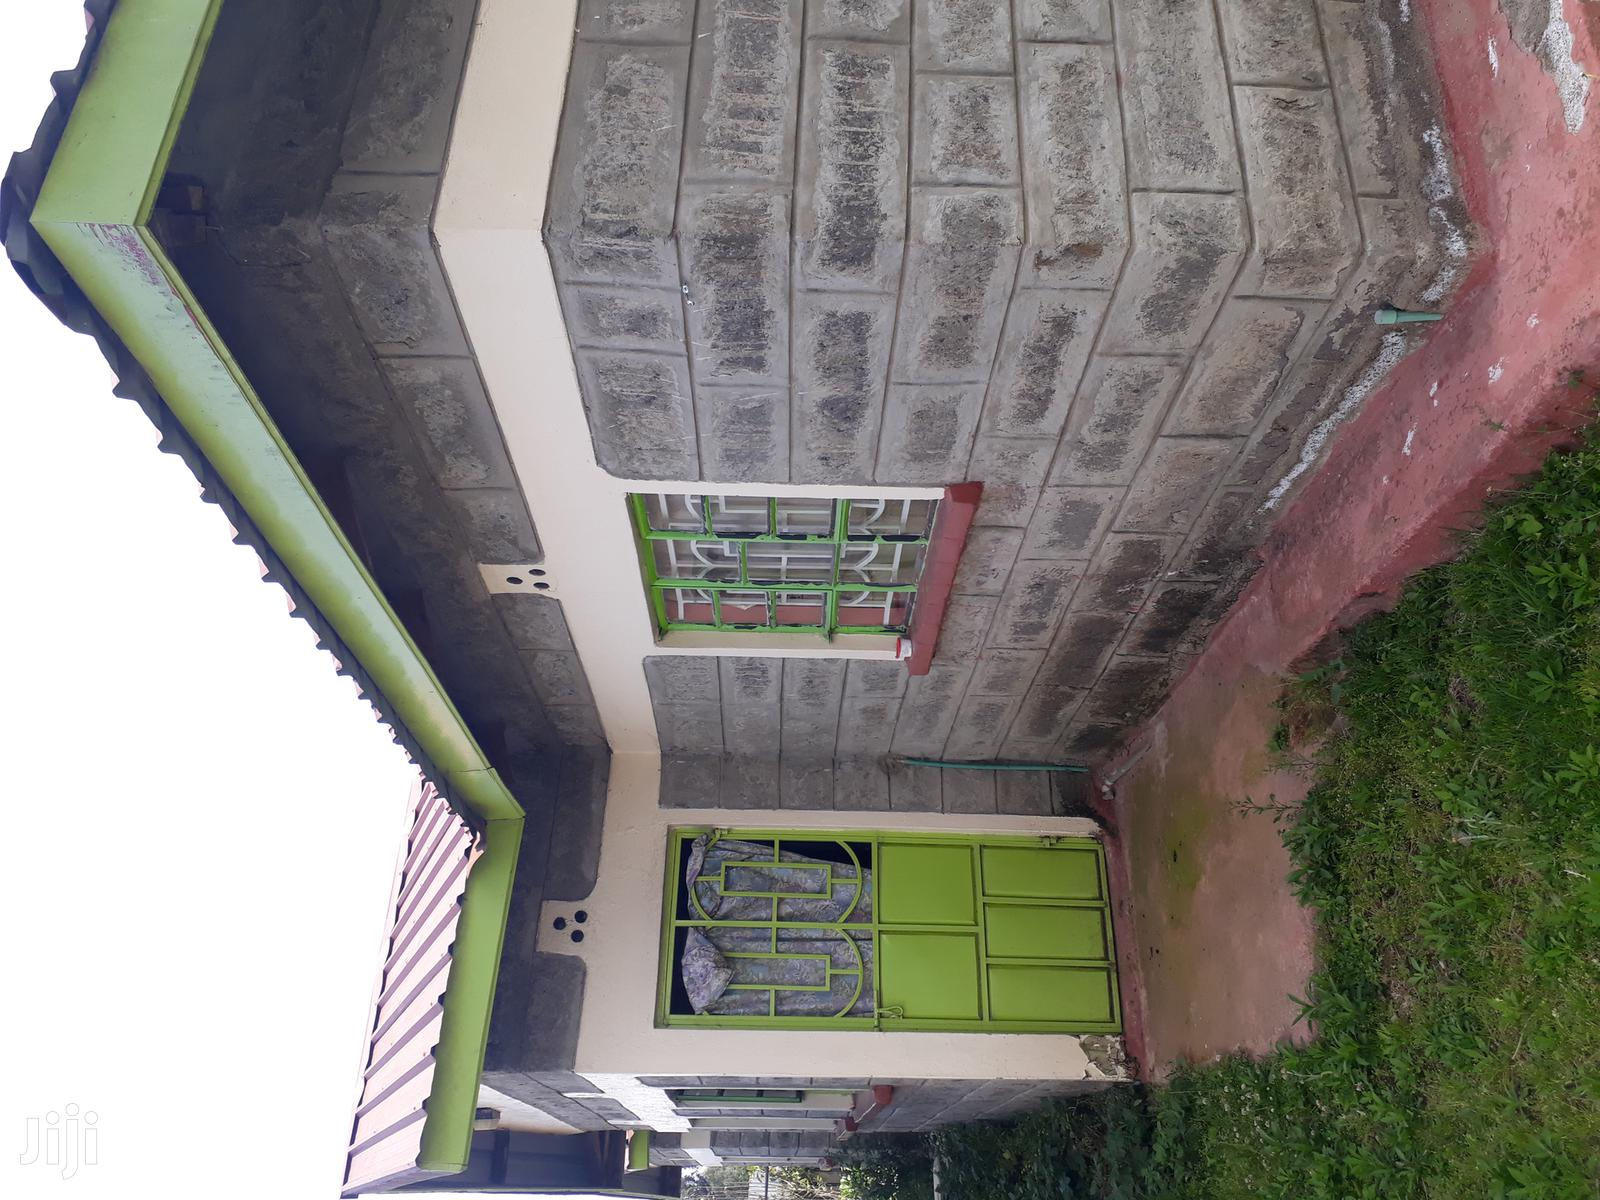 House for Sale in North Kinangop   Houses & Apartments For Sale for sale in North Kinangop, Nyandarua, Kenya